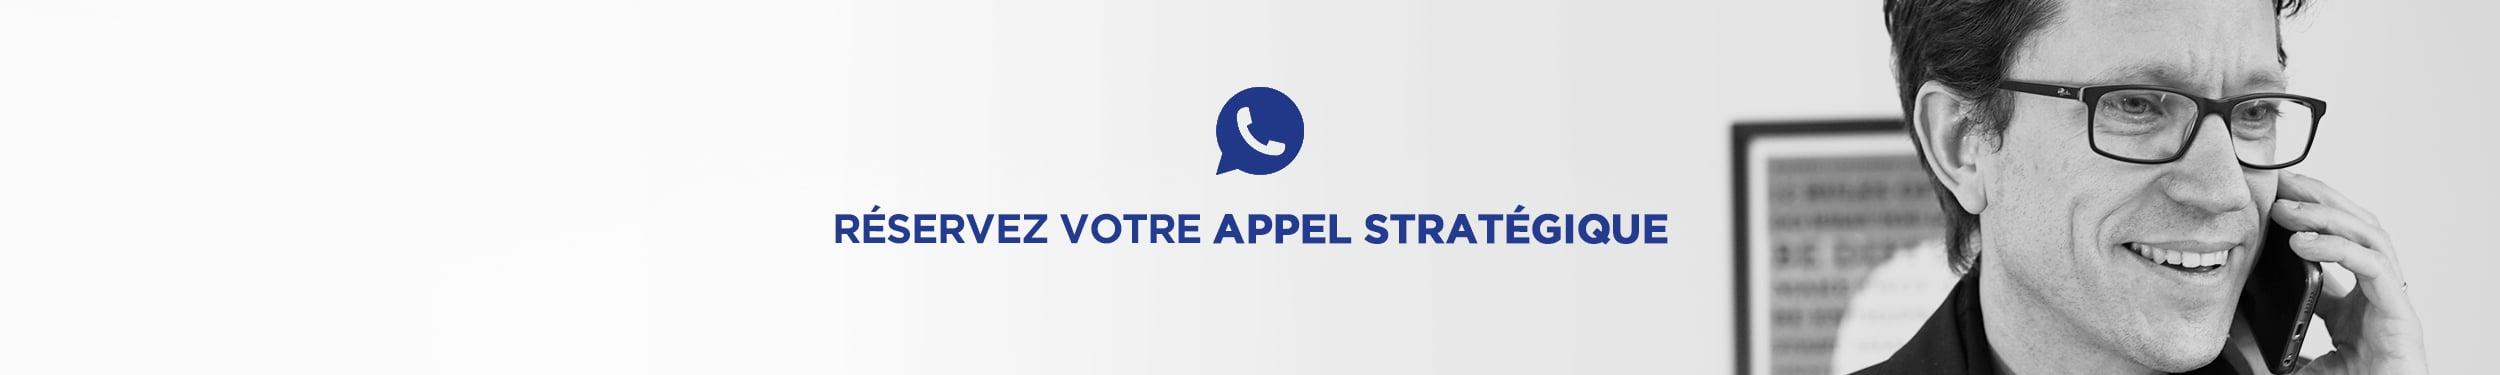 Banniere_appel_strat2